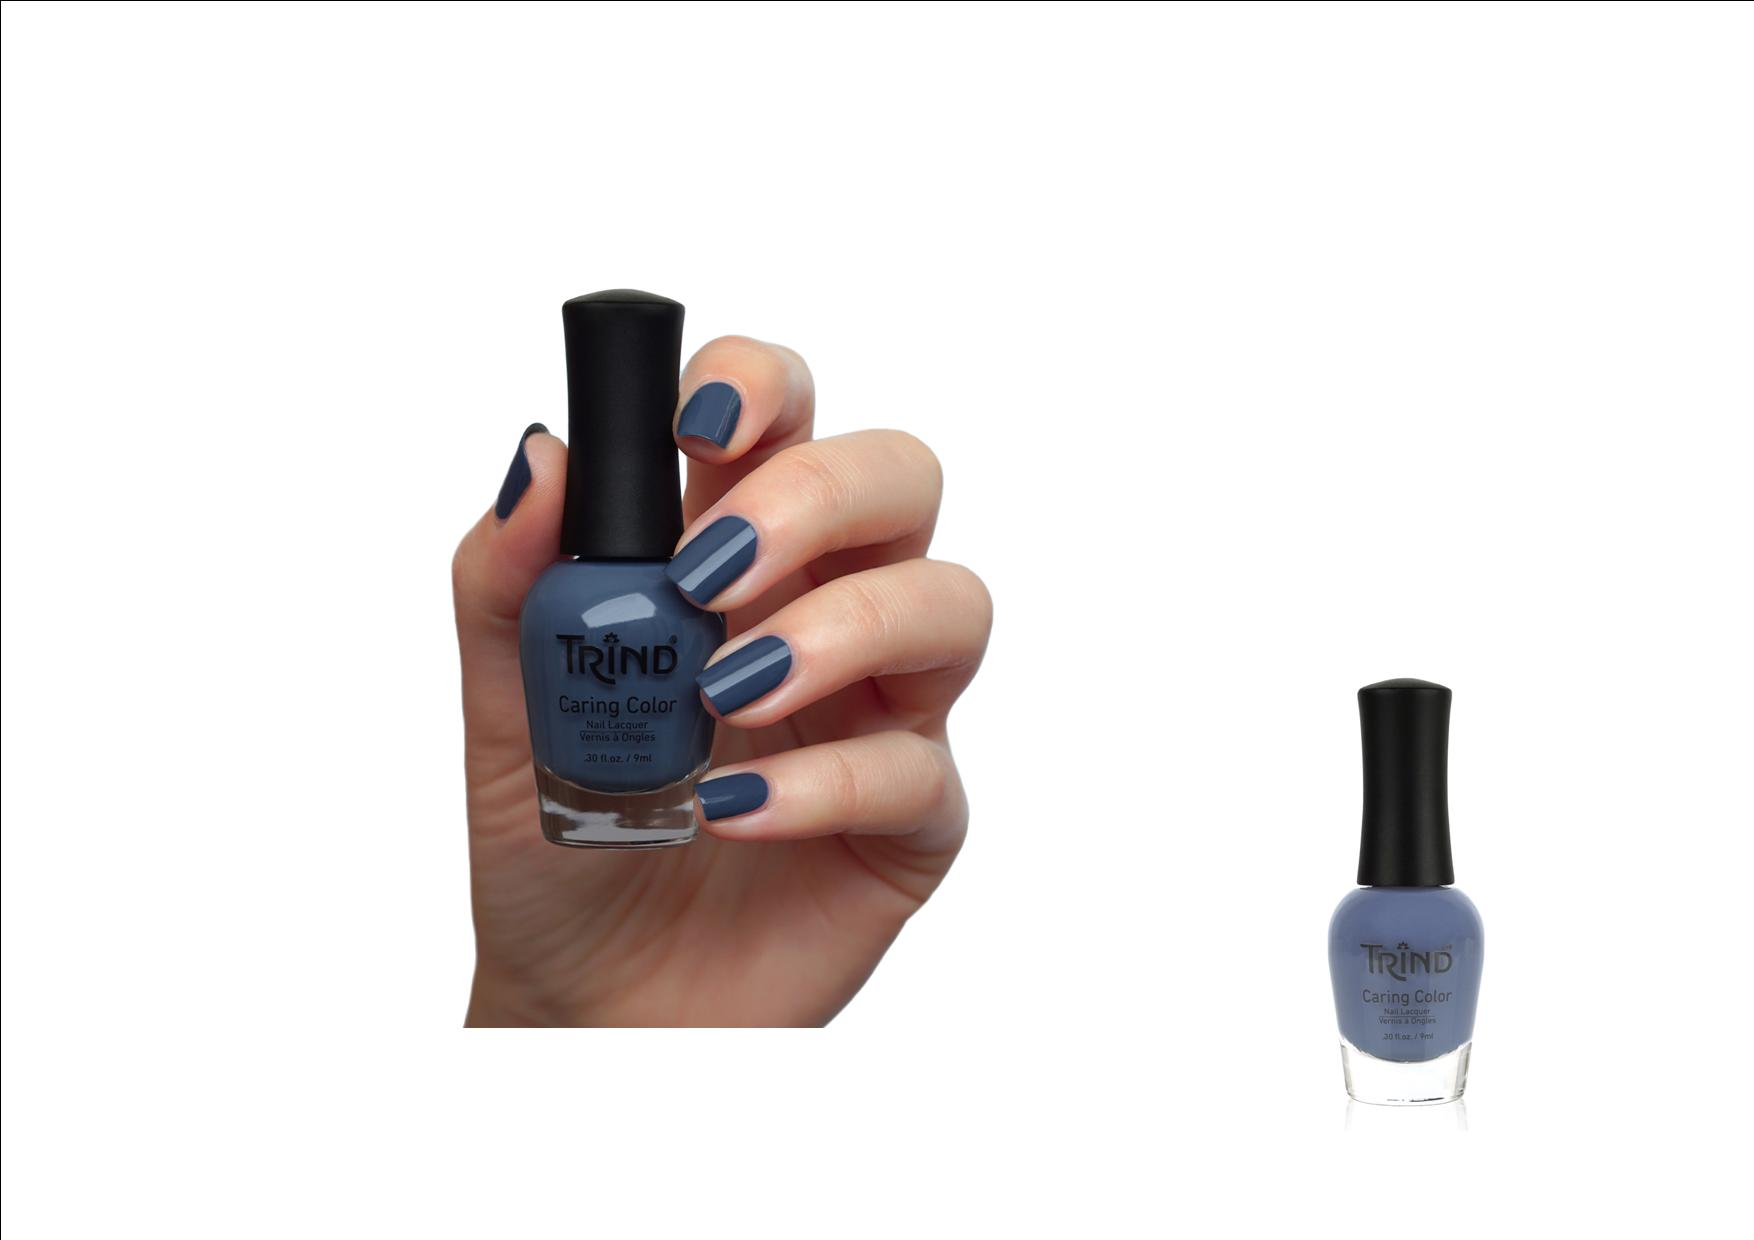 Trind Caring Color Nagellak 240 Jeans Blue